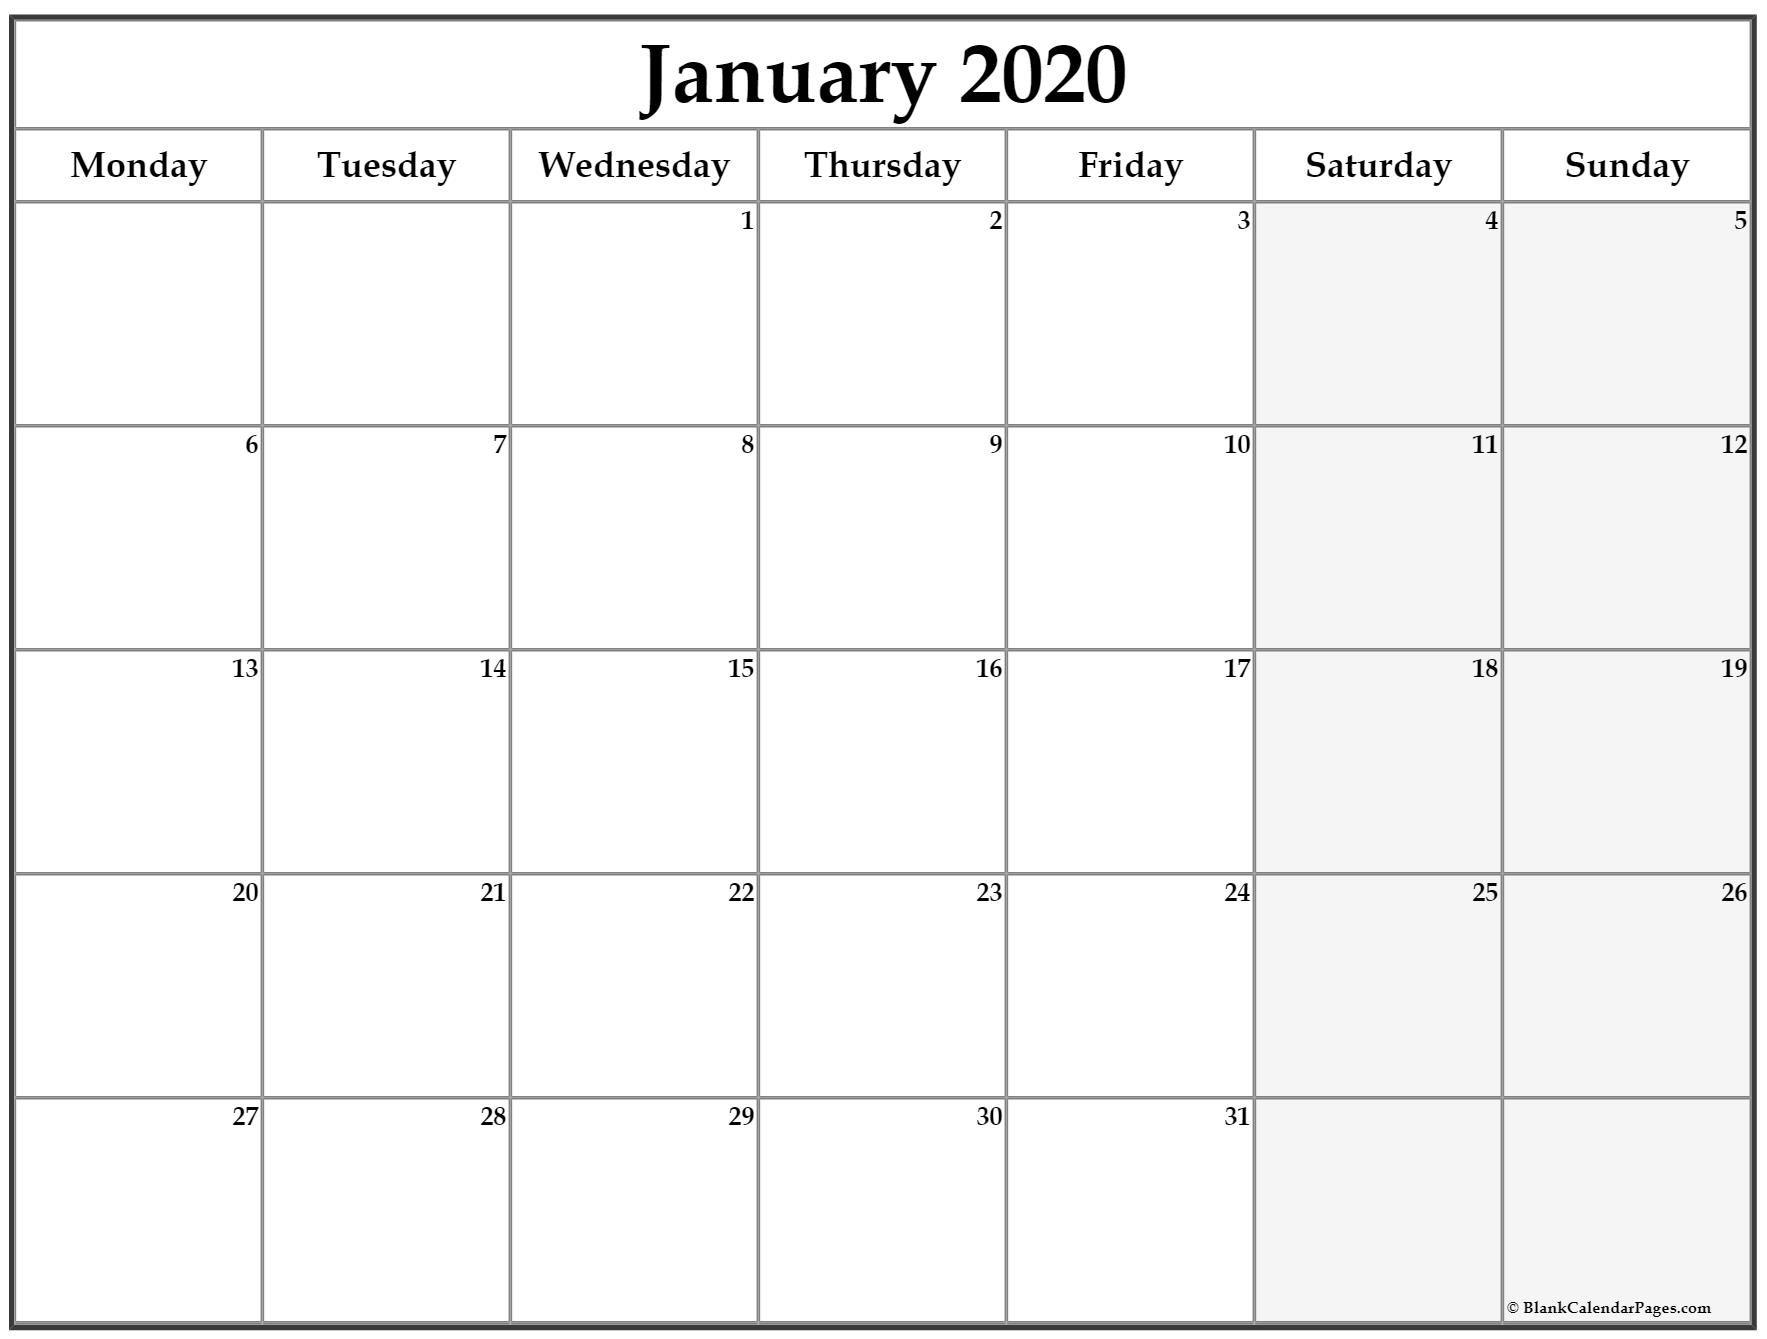 The Free Printable Monday Thru Sunday Calendars | Get Your Calendar Printable